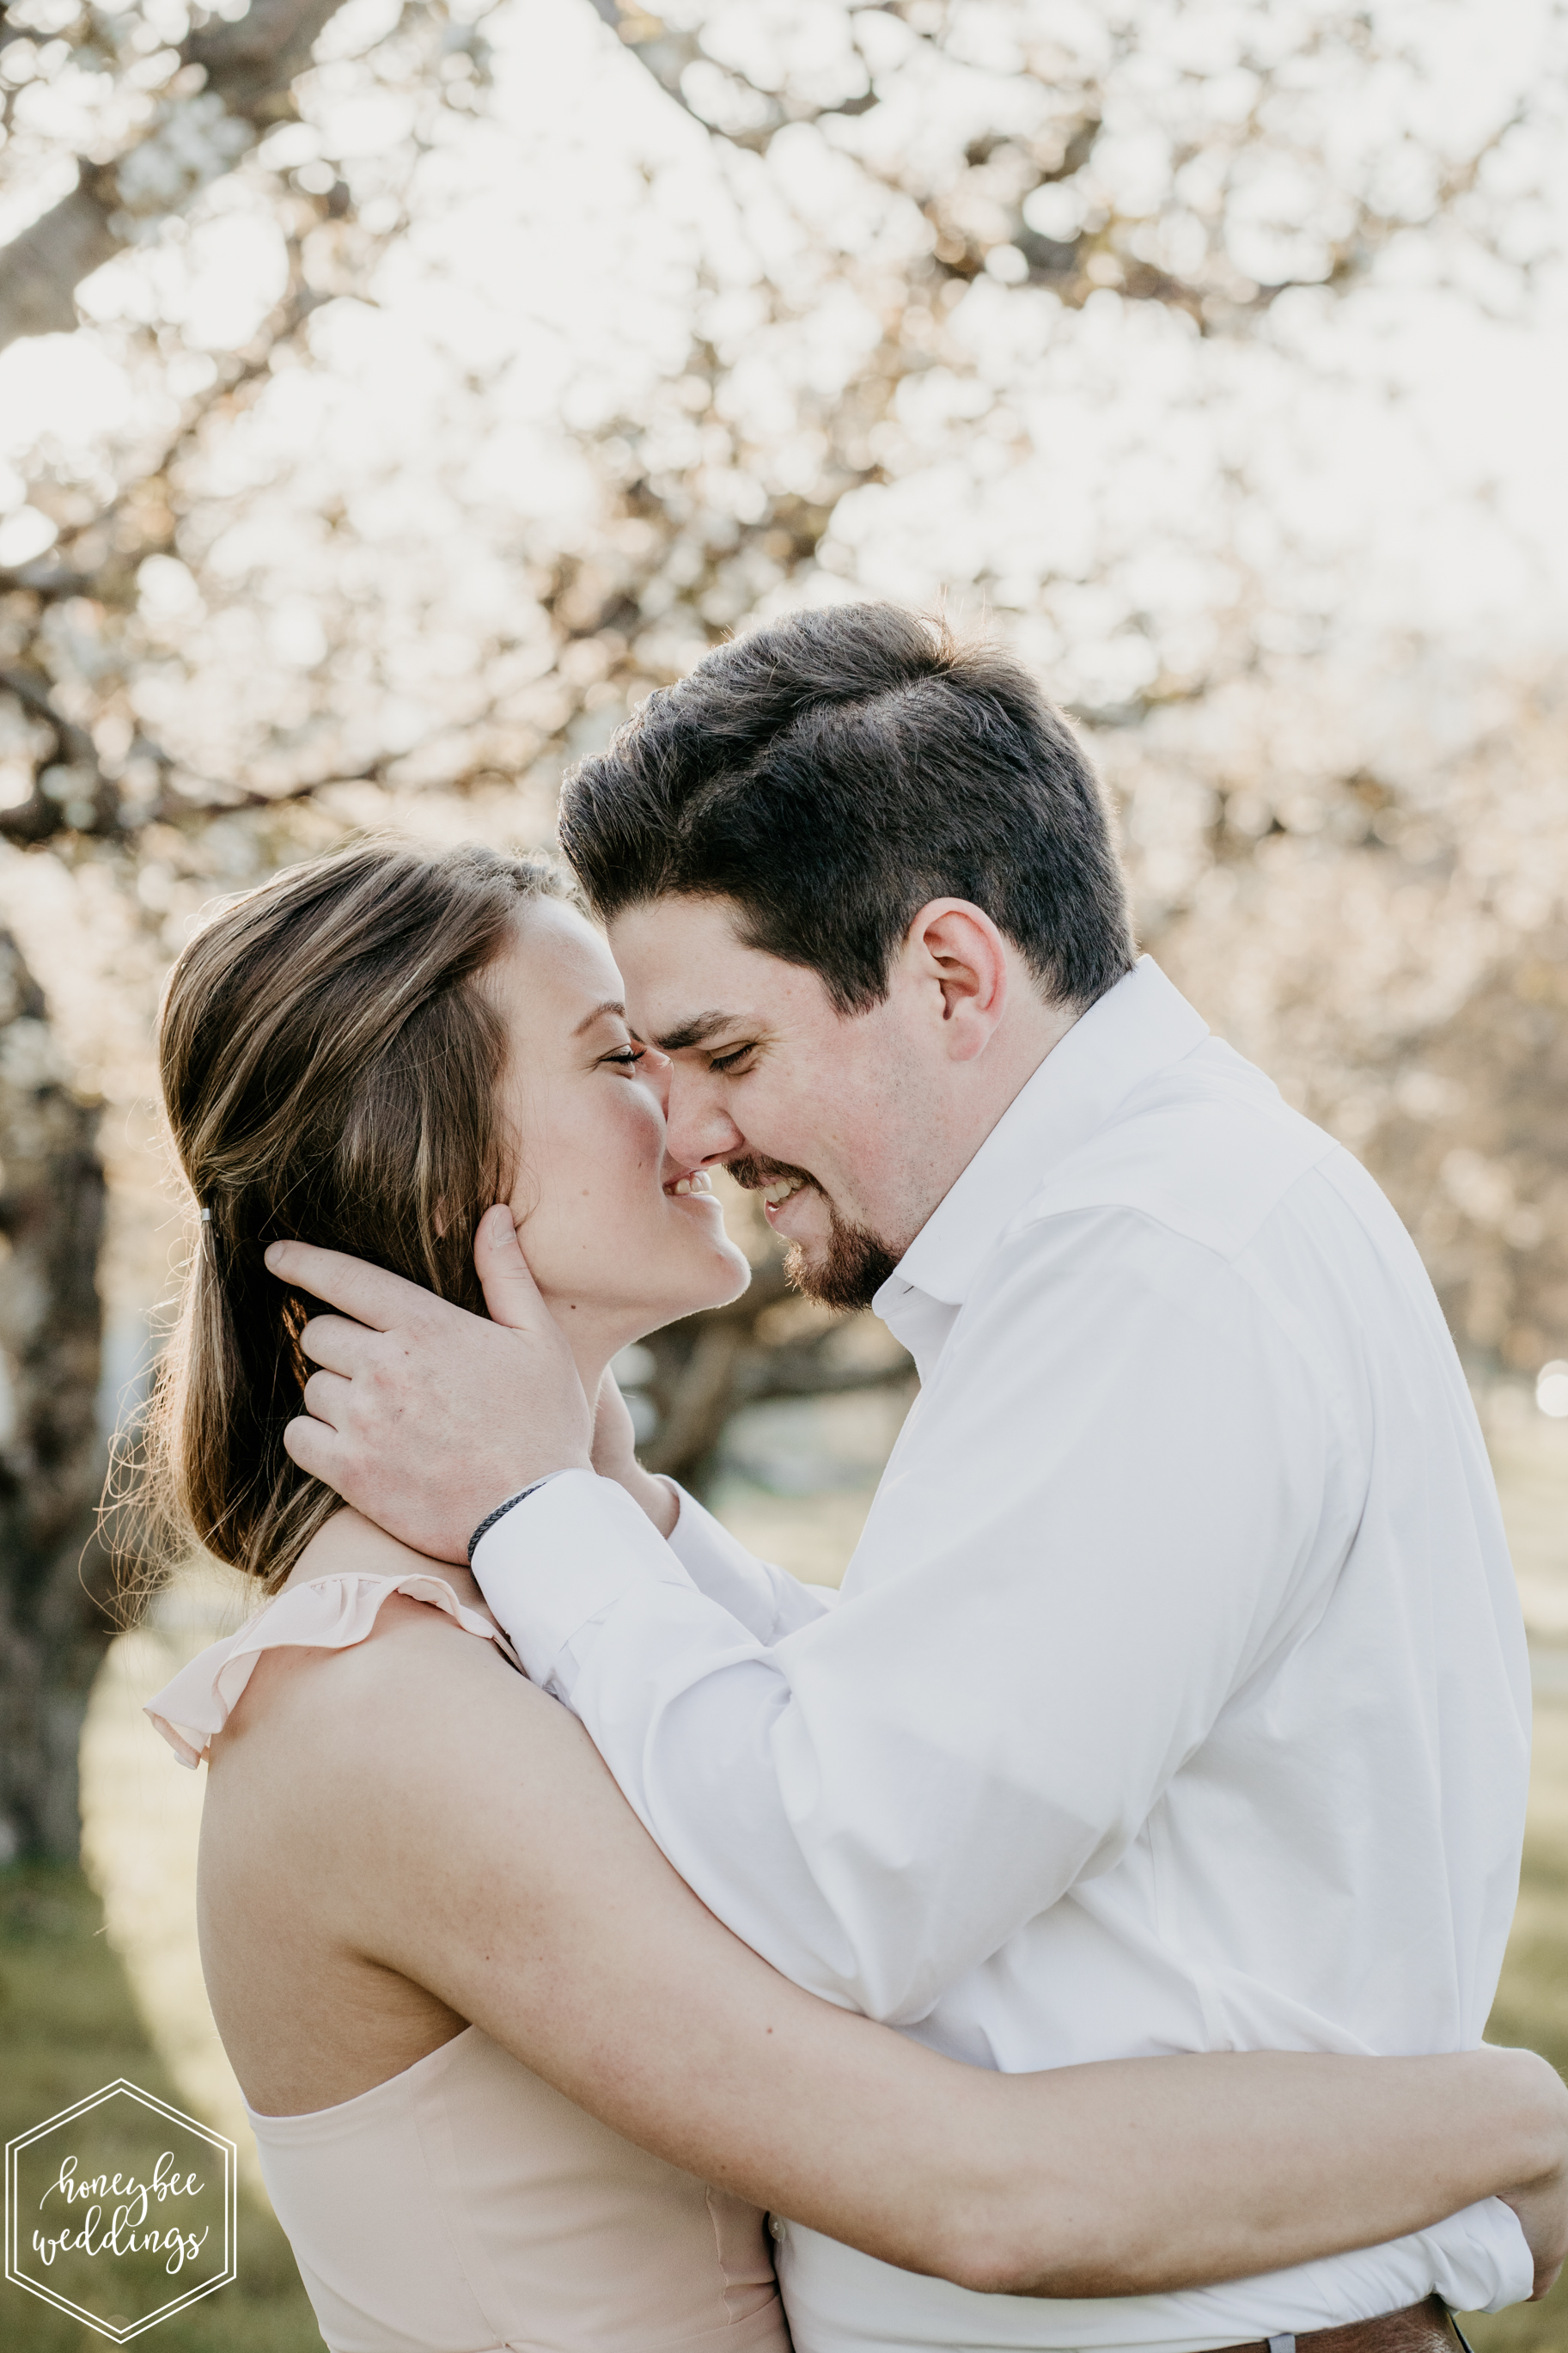 100Montana Wedding Photographer_Cherry Blossom Engagement Session_Ashlin & Luke_Honeybee Weddings_May 11, 2019-309.jpg